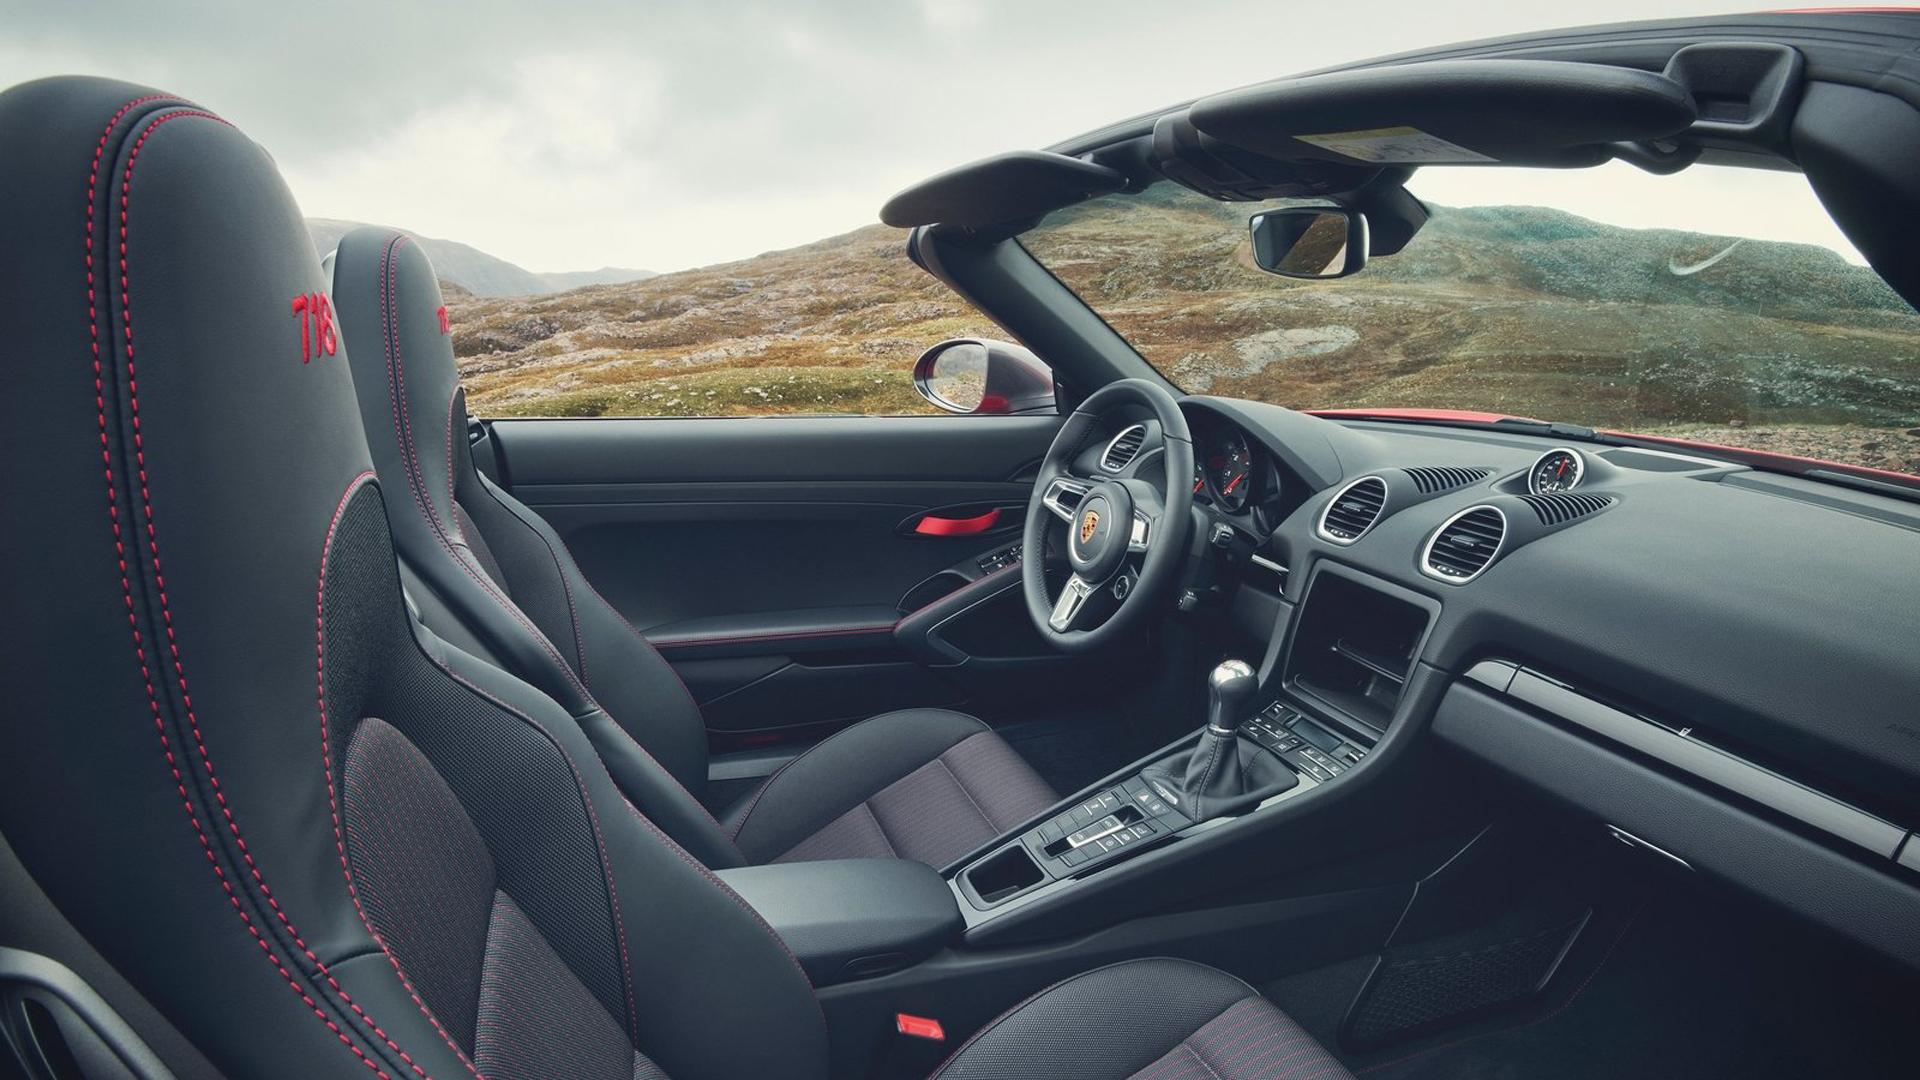 Porsche 718 Cayman / Boxster T Touring